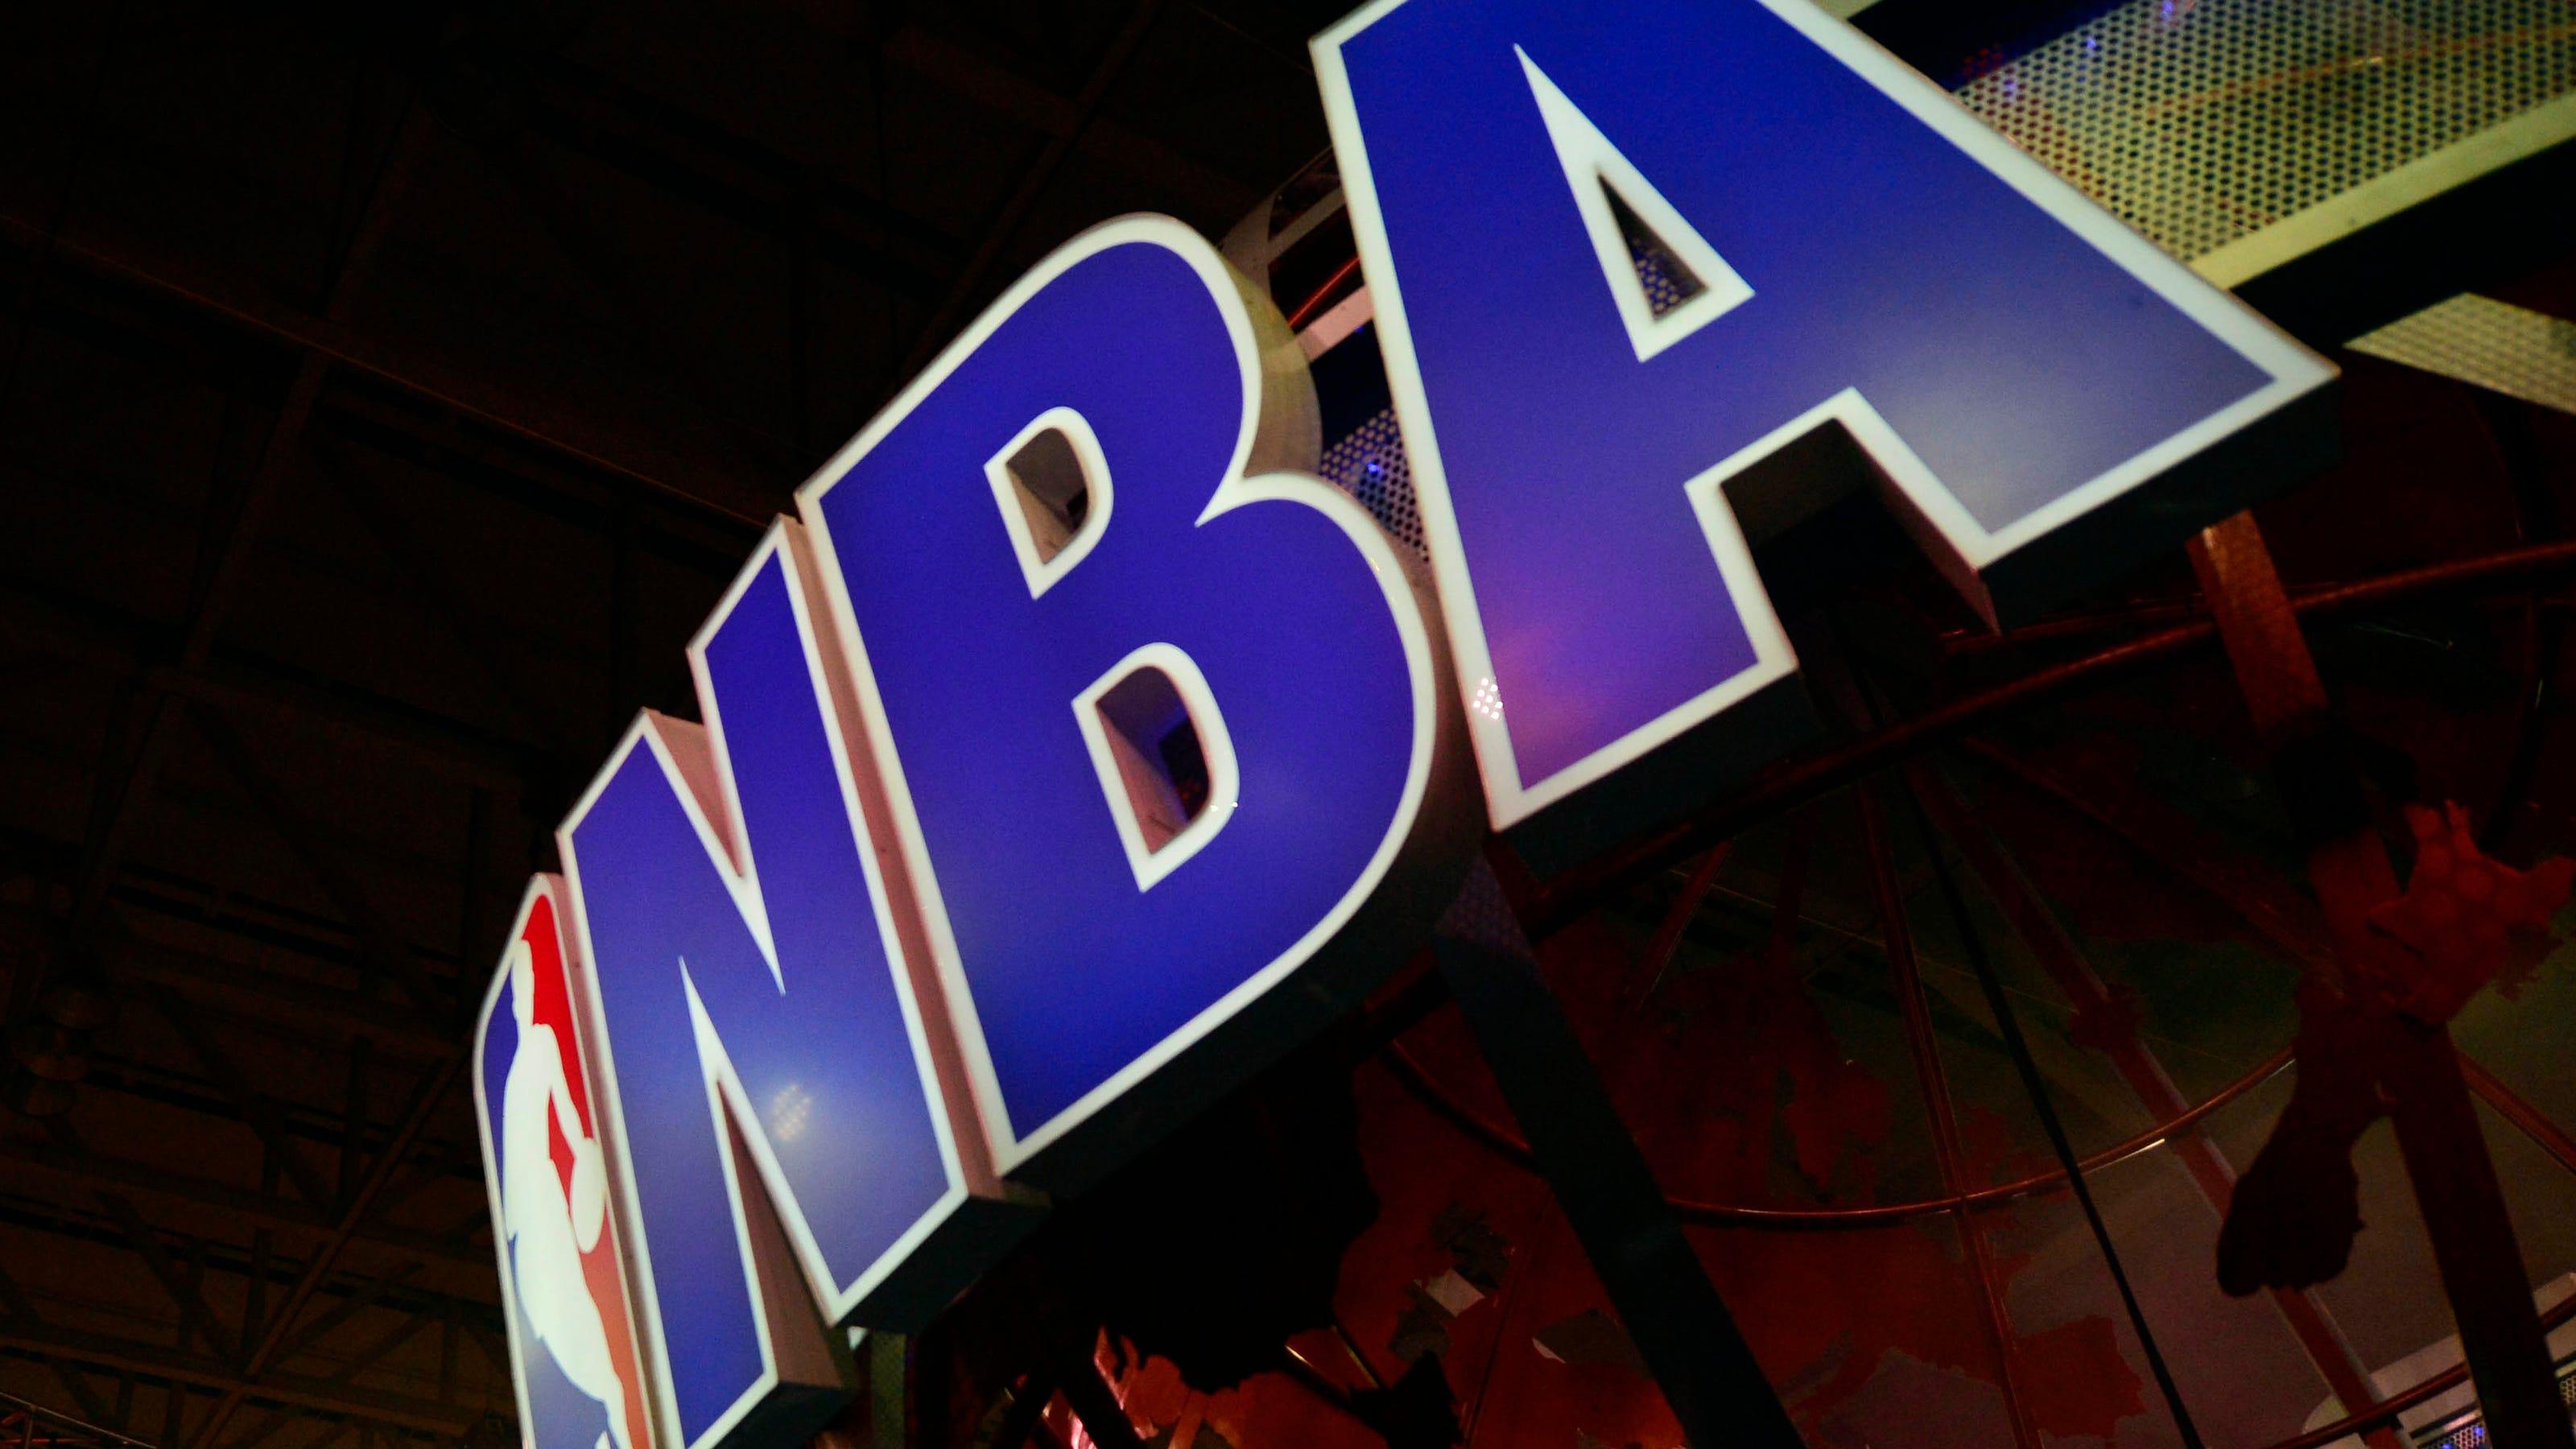 NBA fires photographer who posted offensive meme about Sen. Kamala Harris